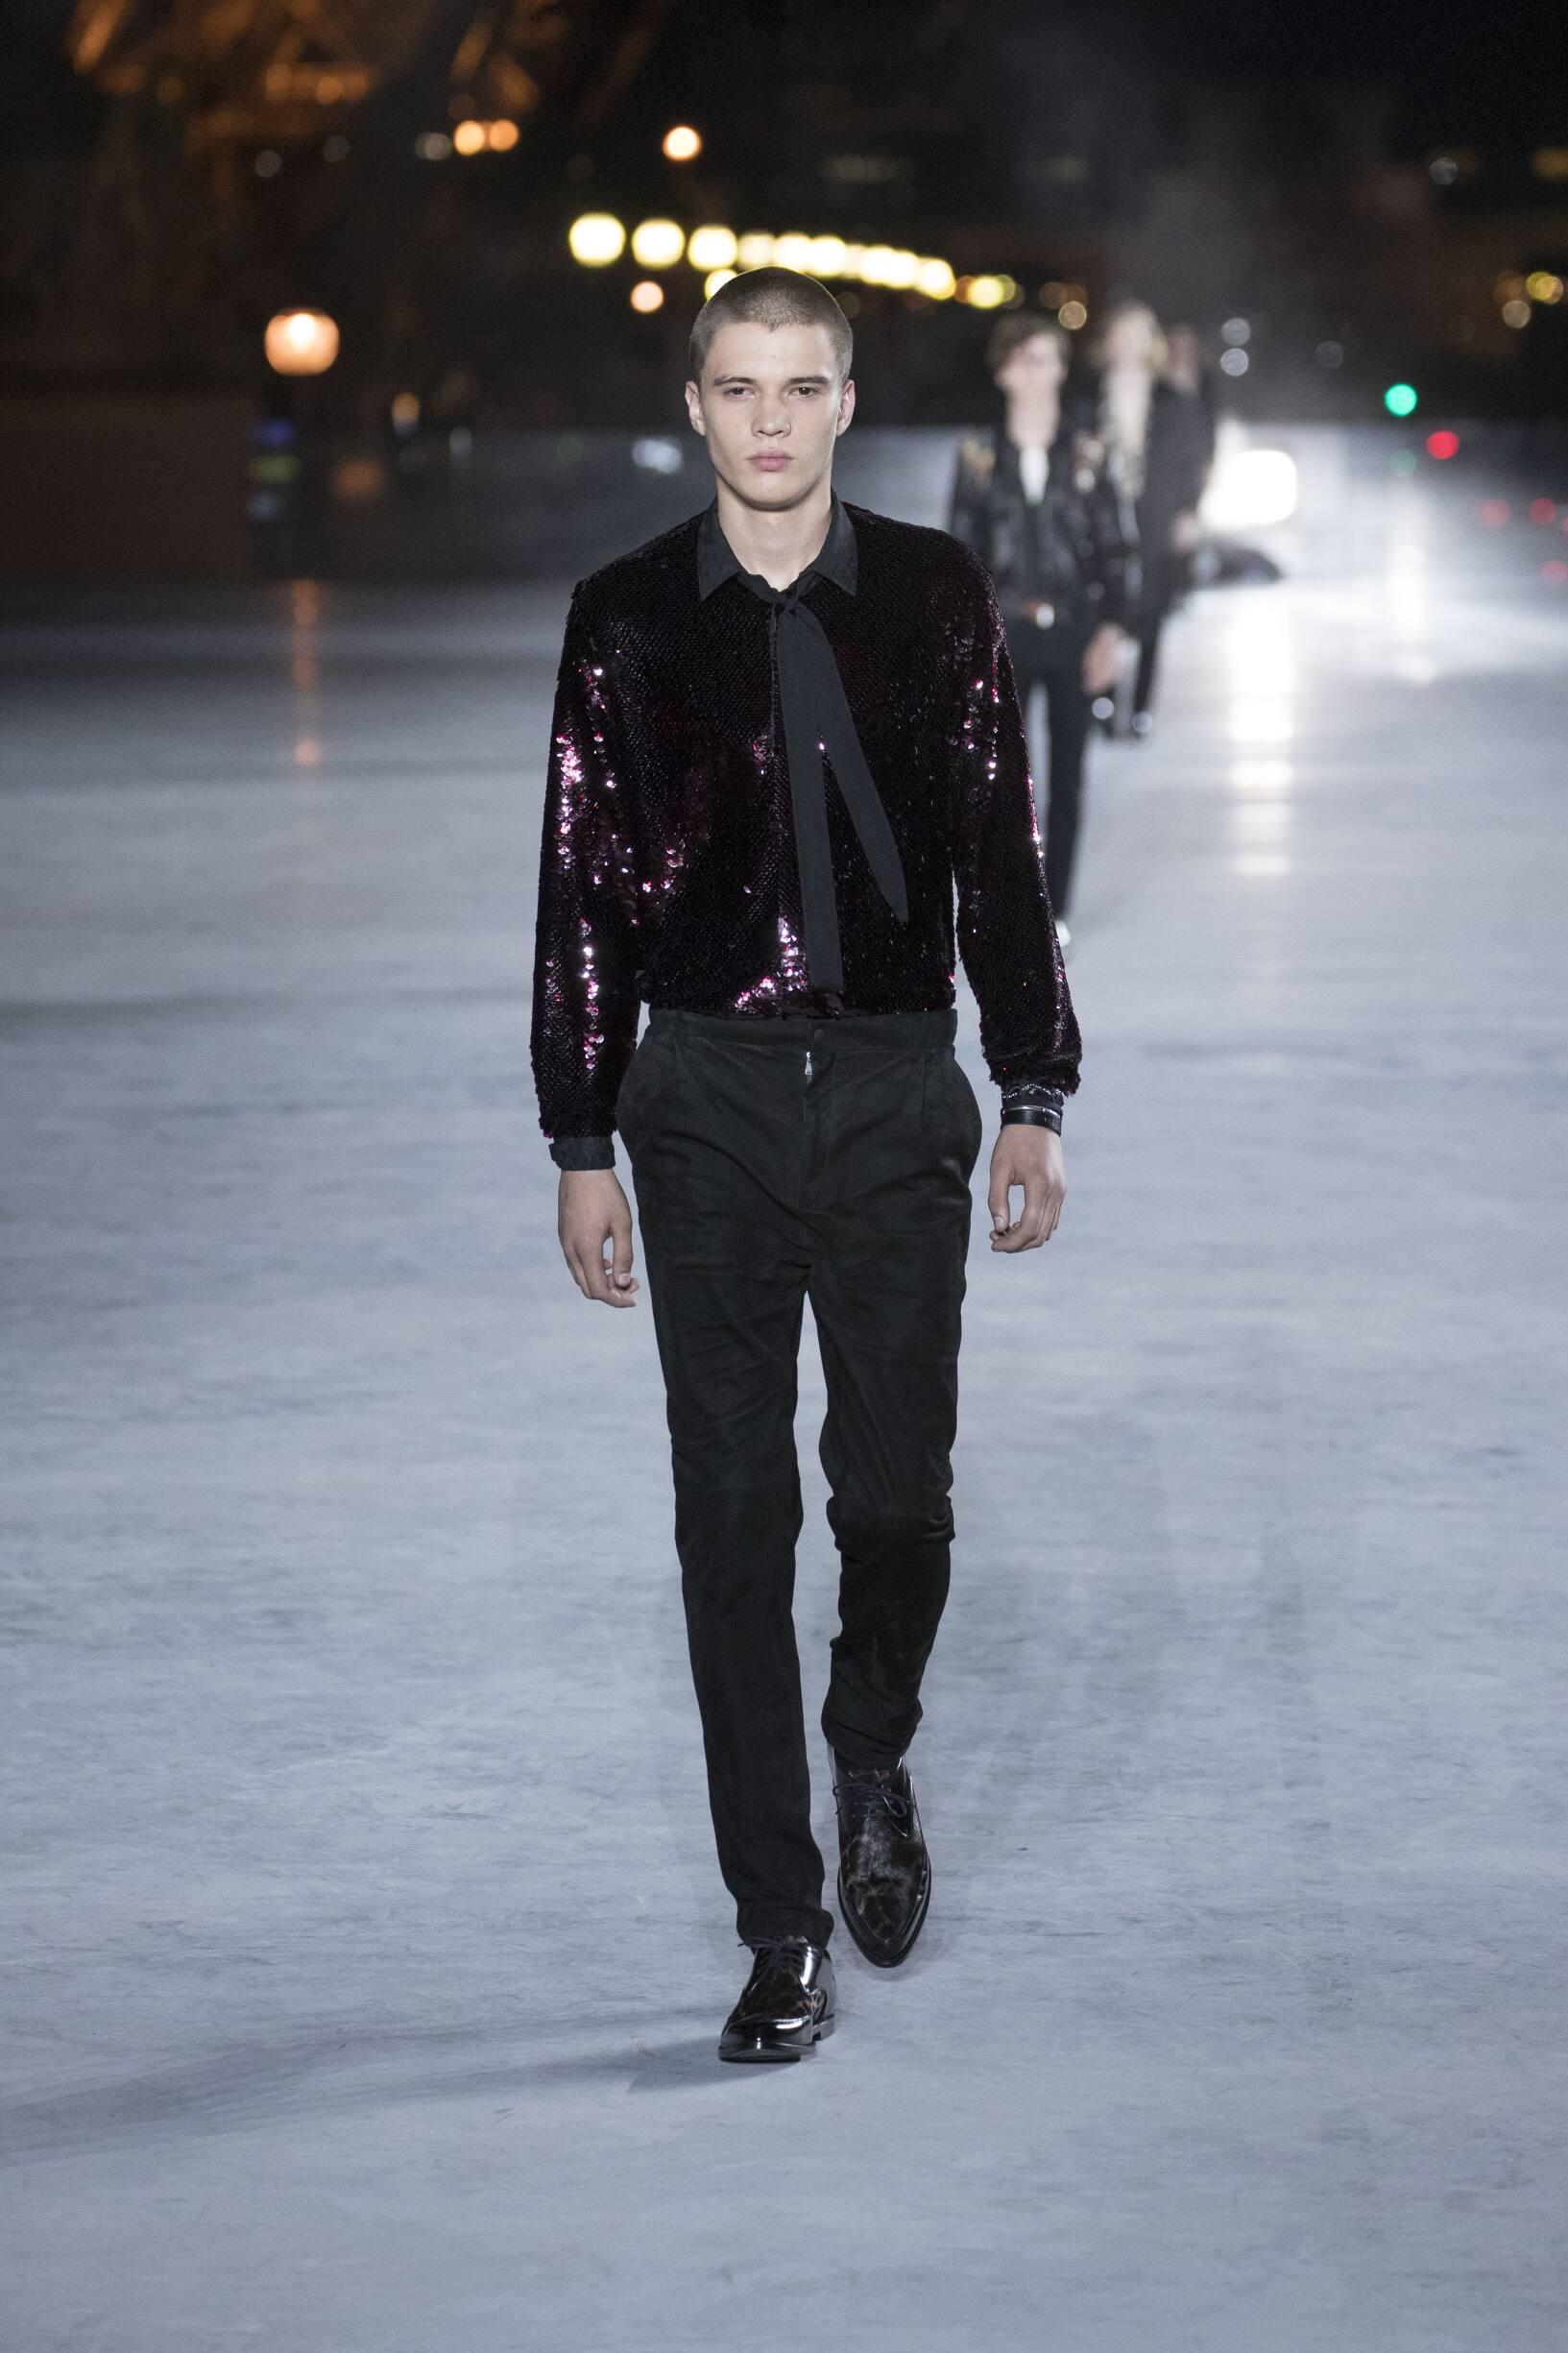 Catwalk Saint Laurent Man Fashion Show Summer 2018